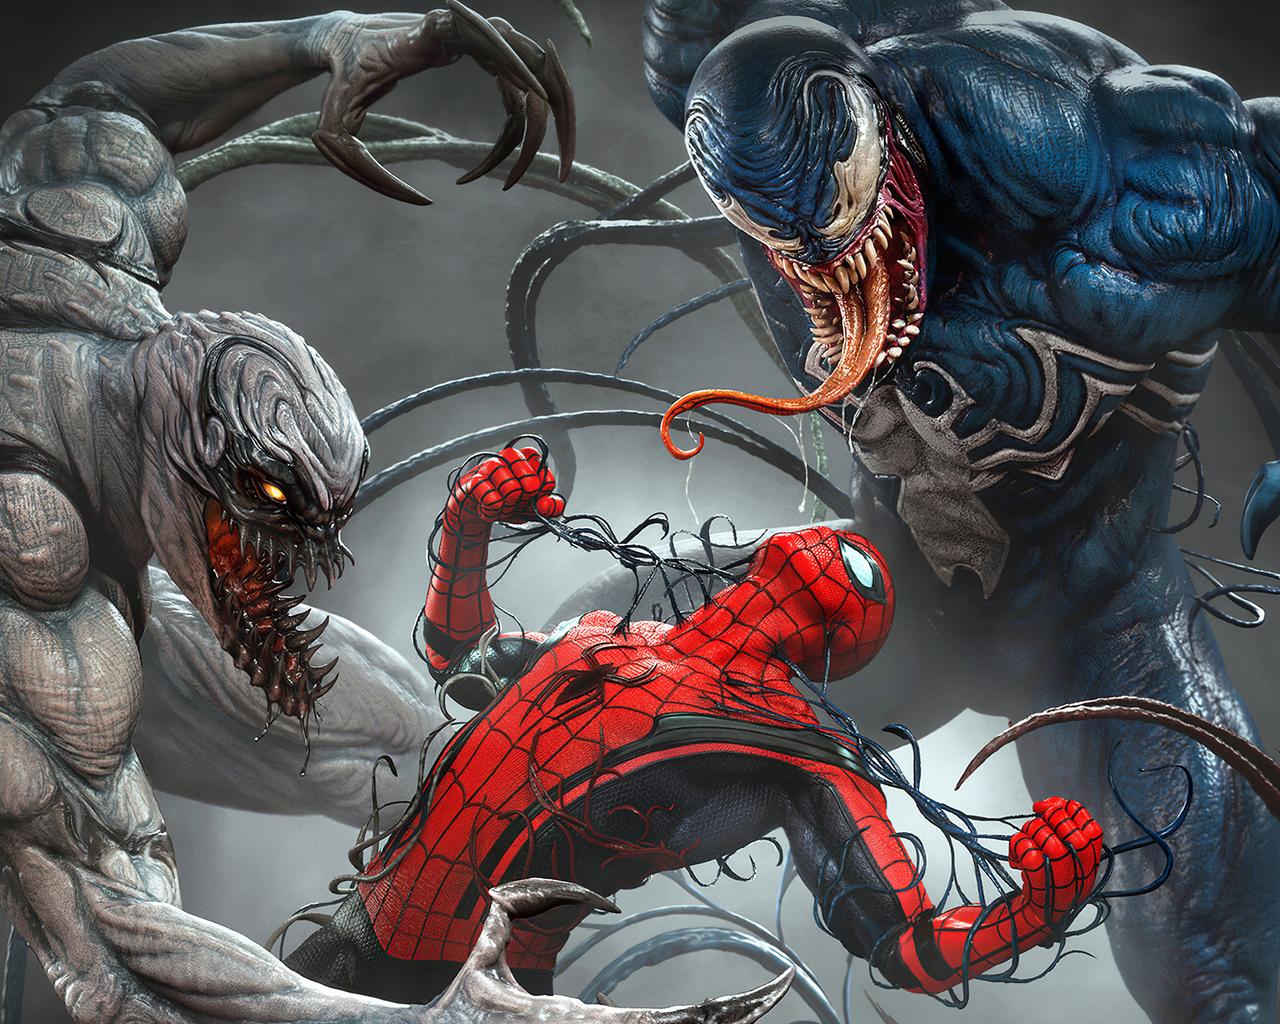 spider-man-vs-venomized-sq.jpg